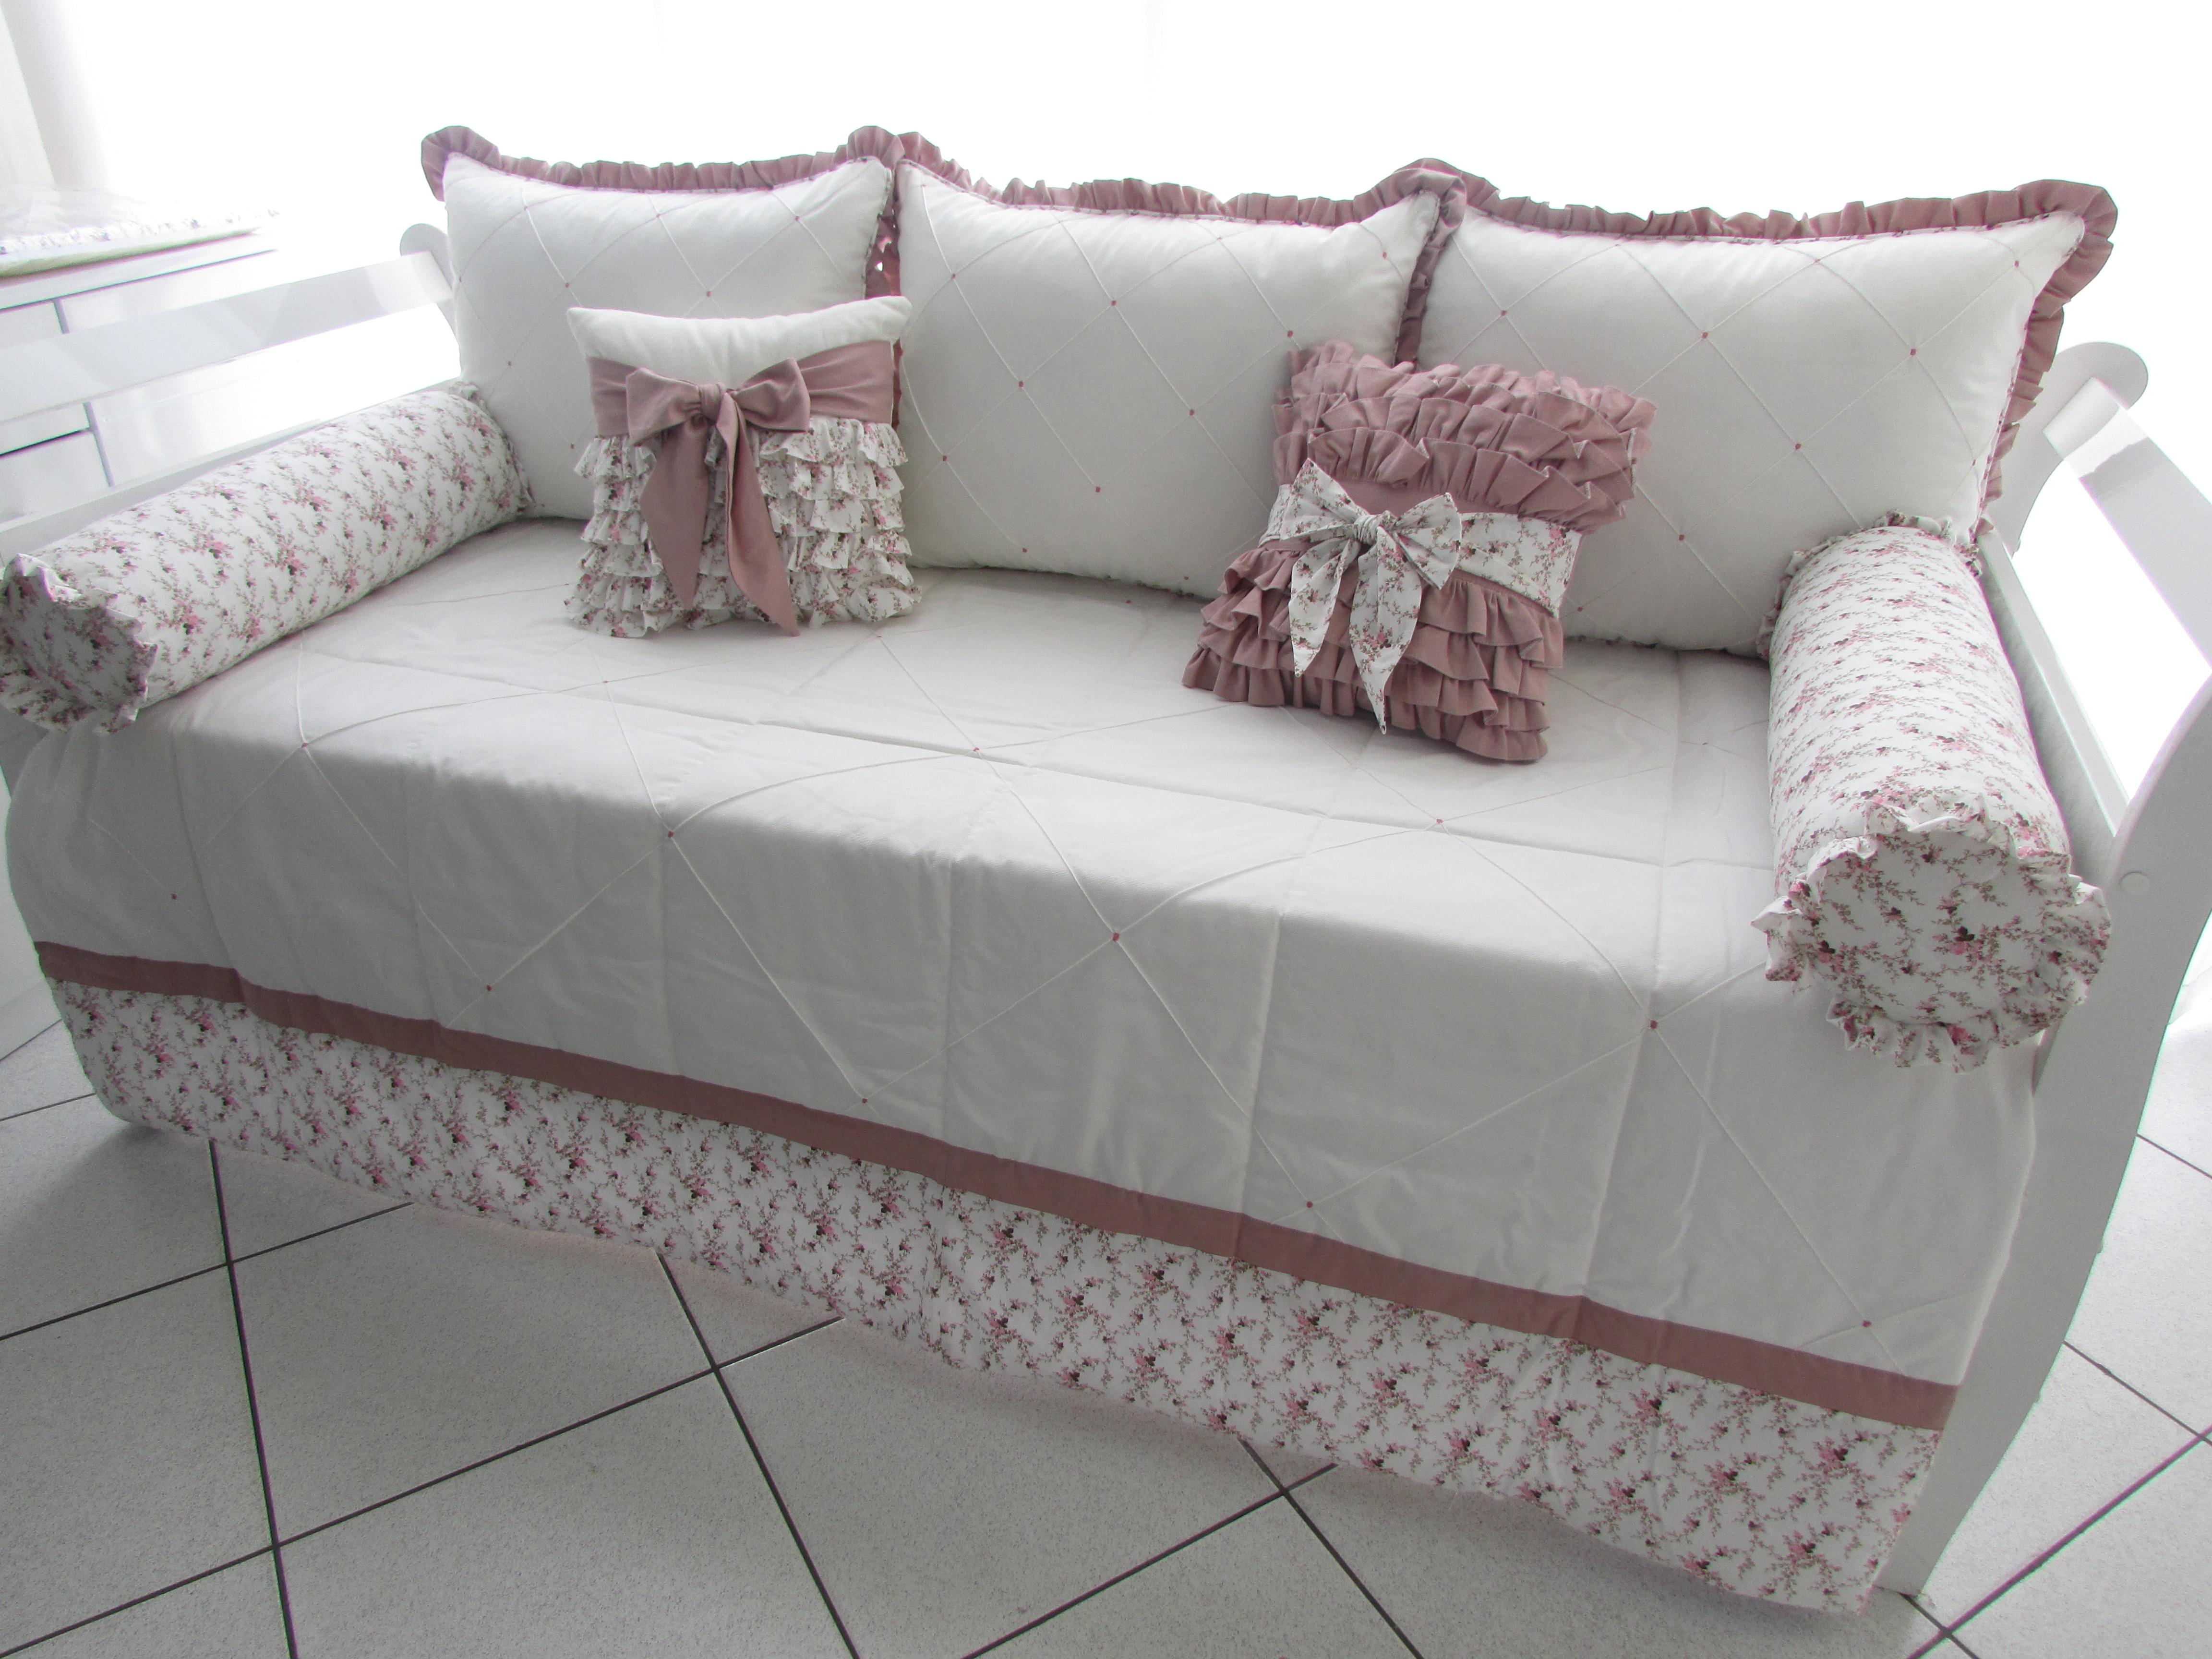 Kit cama bab lara enxovais cordeirinho elo7 - Camas para bebe ...